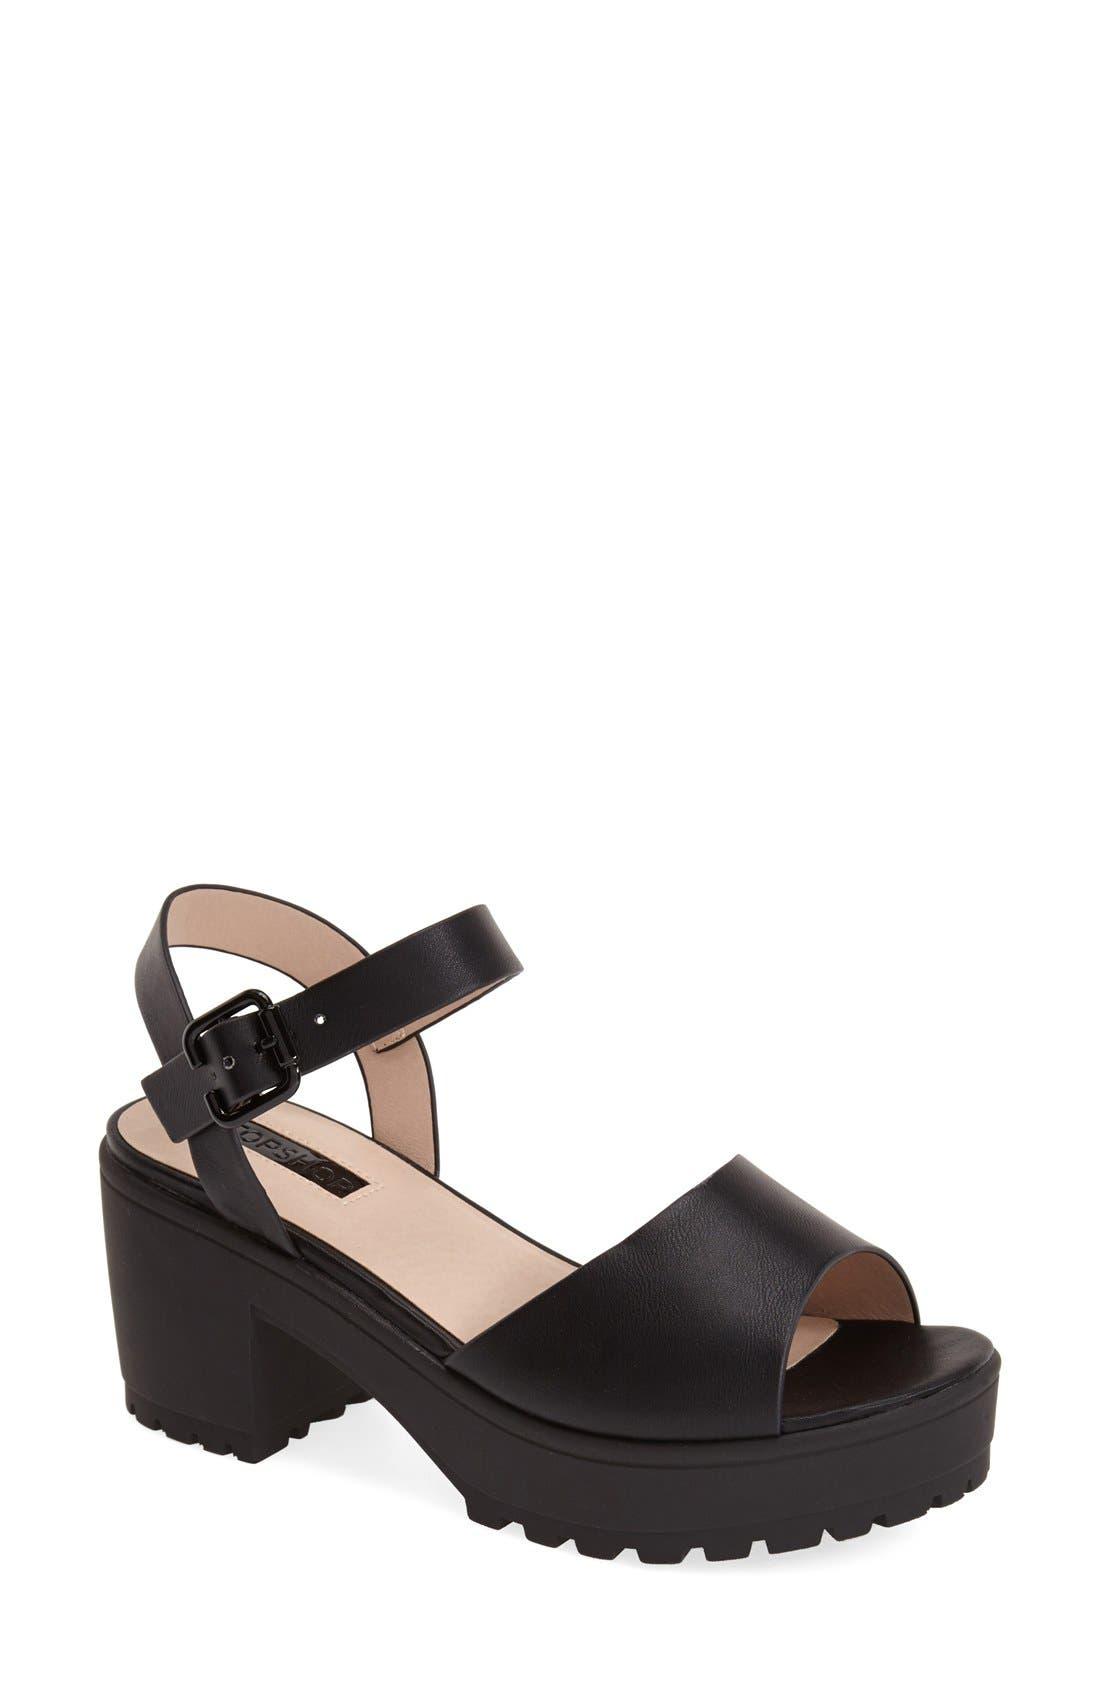 Main Image - Topshop 'Hatty' Ankle Strap Sandal (Women)